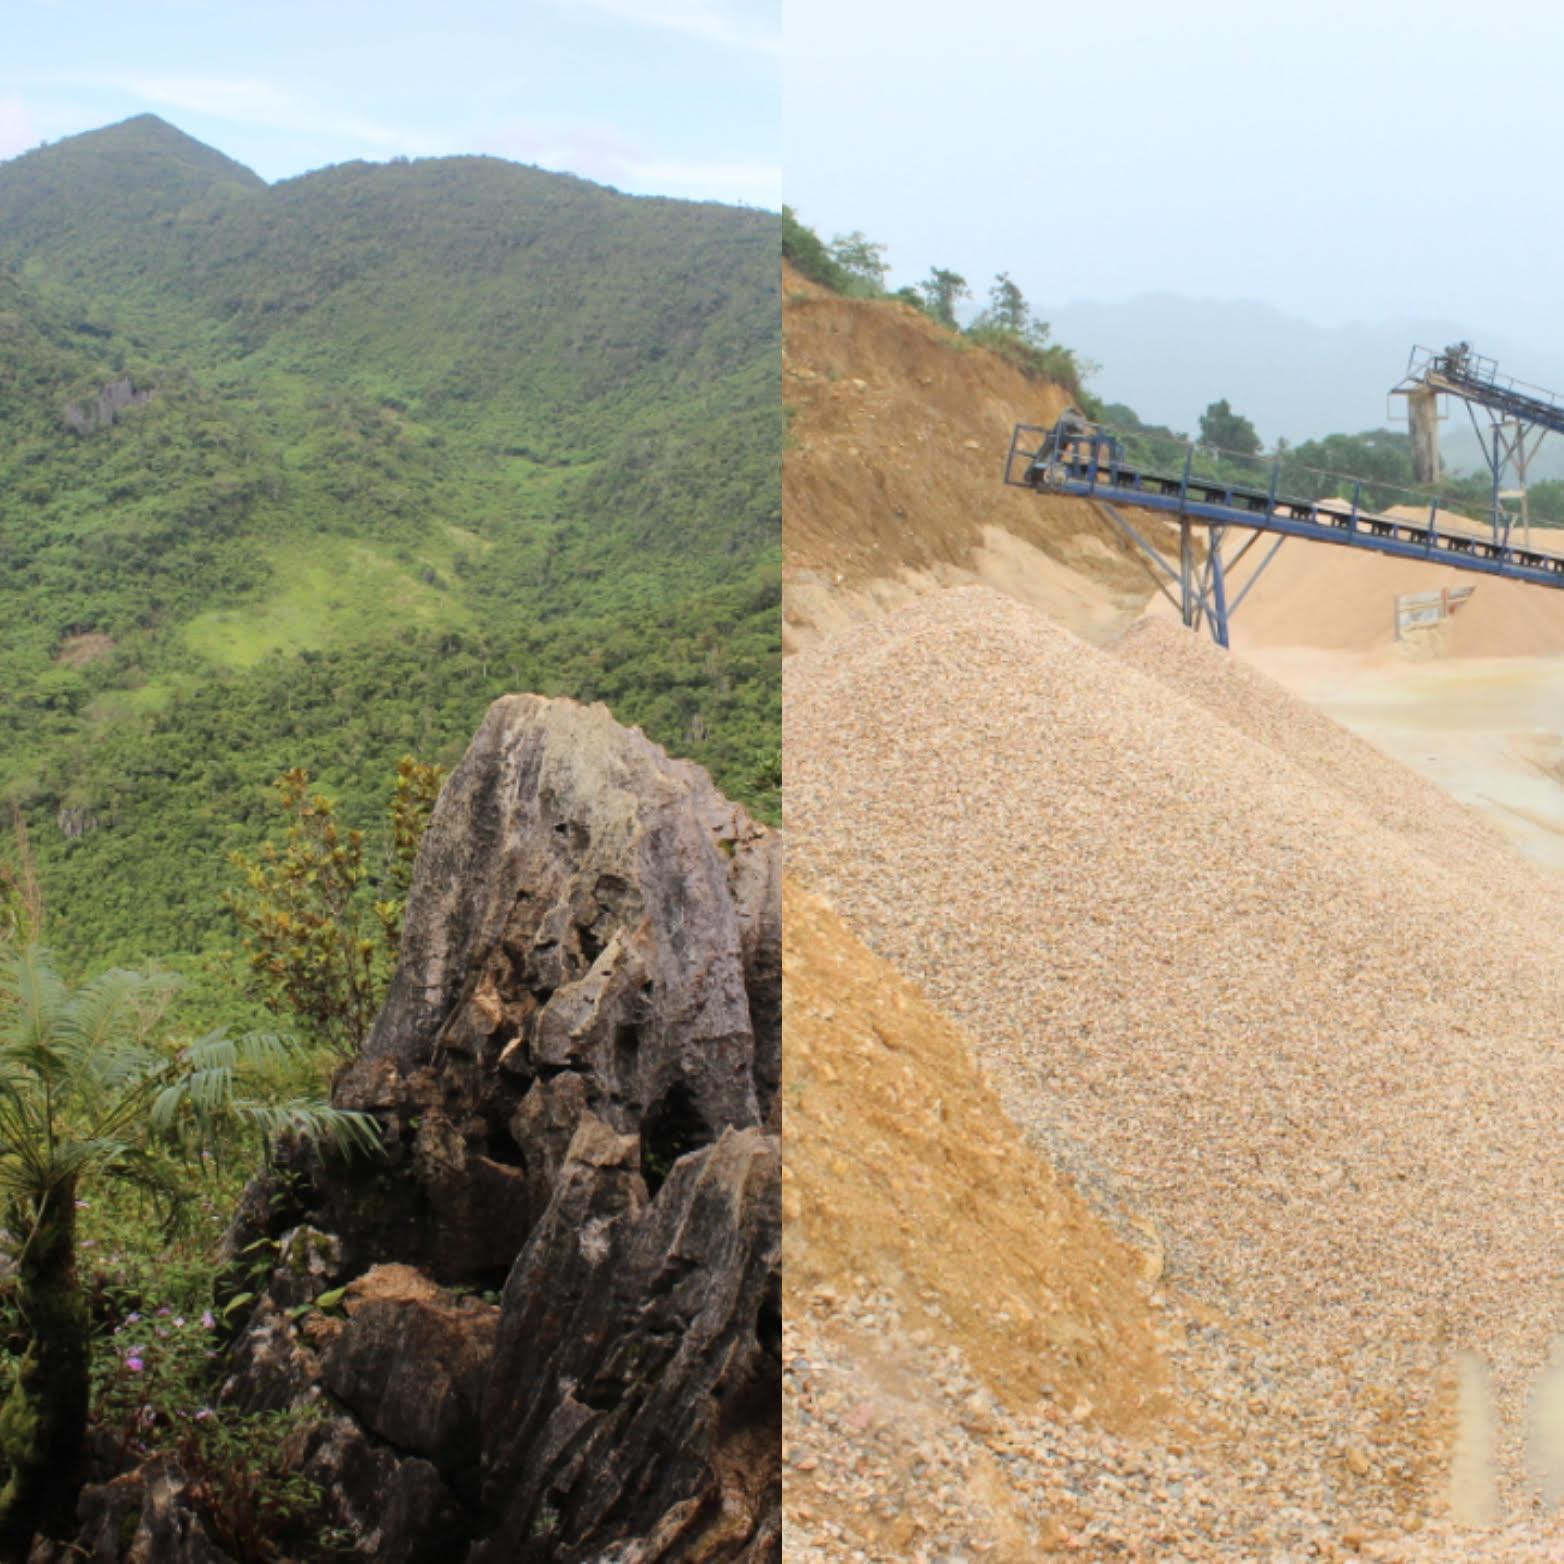 Limestone Karst destroyed through quarrying